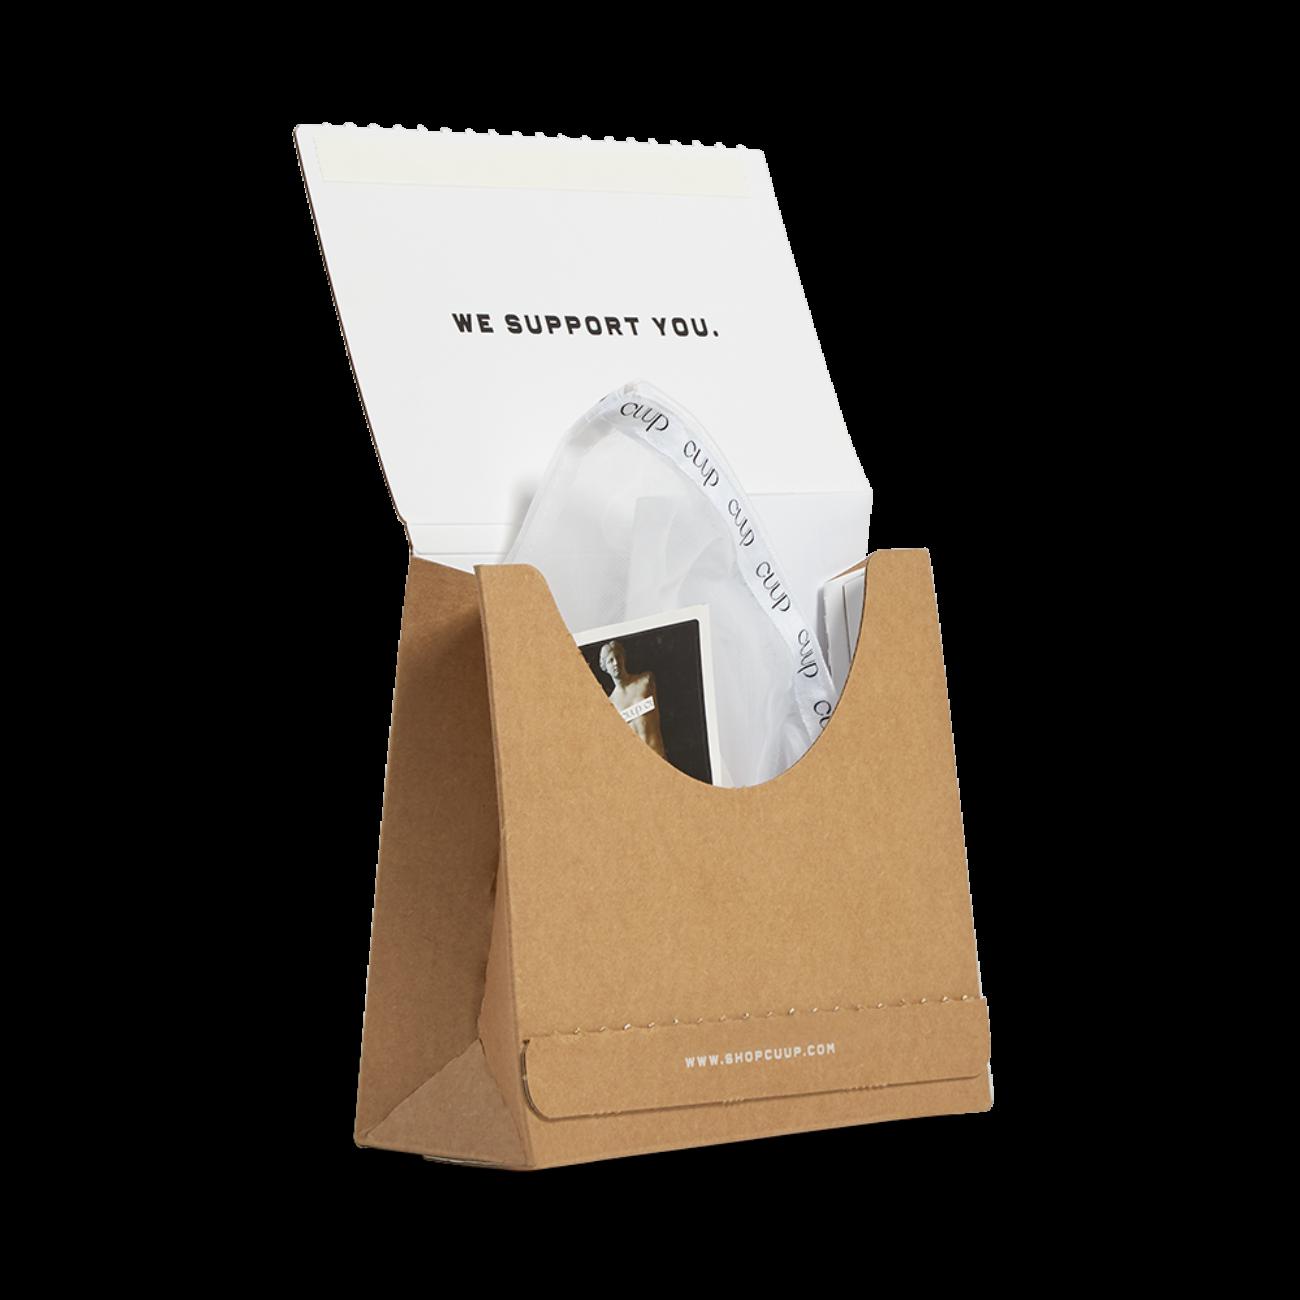 Custom corrugated mailer box with tear strip. Flexography on natural kraft liner.